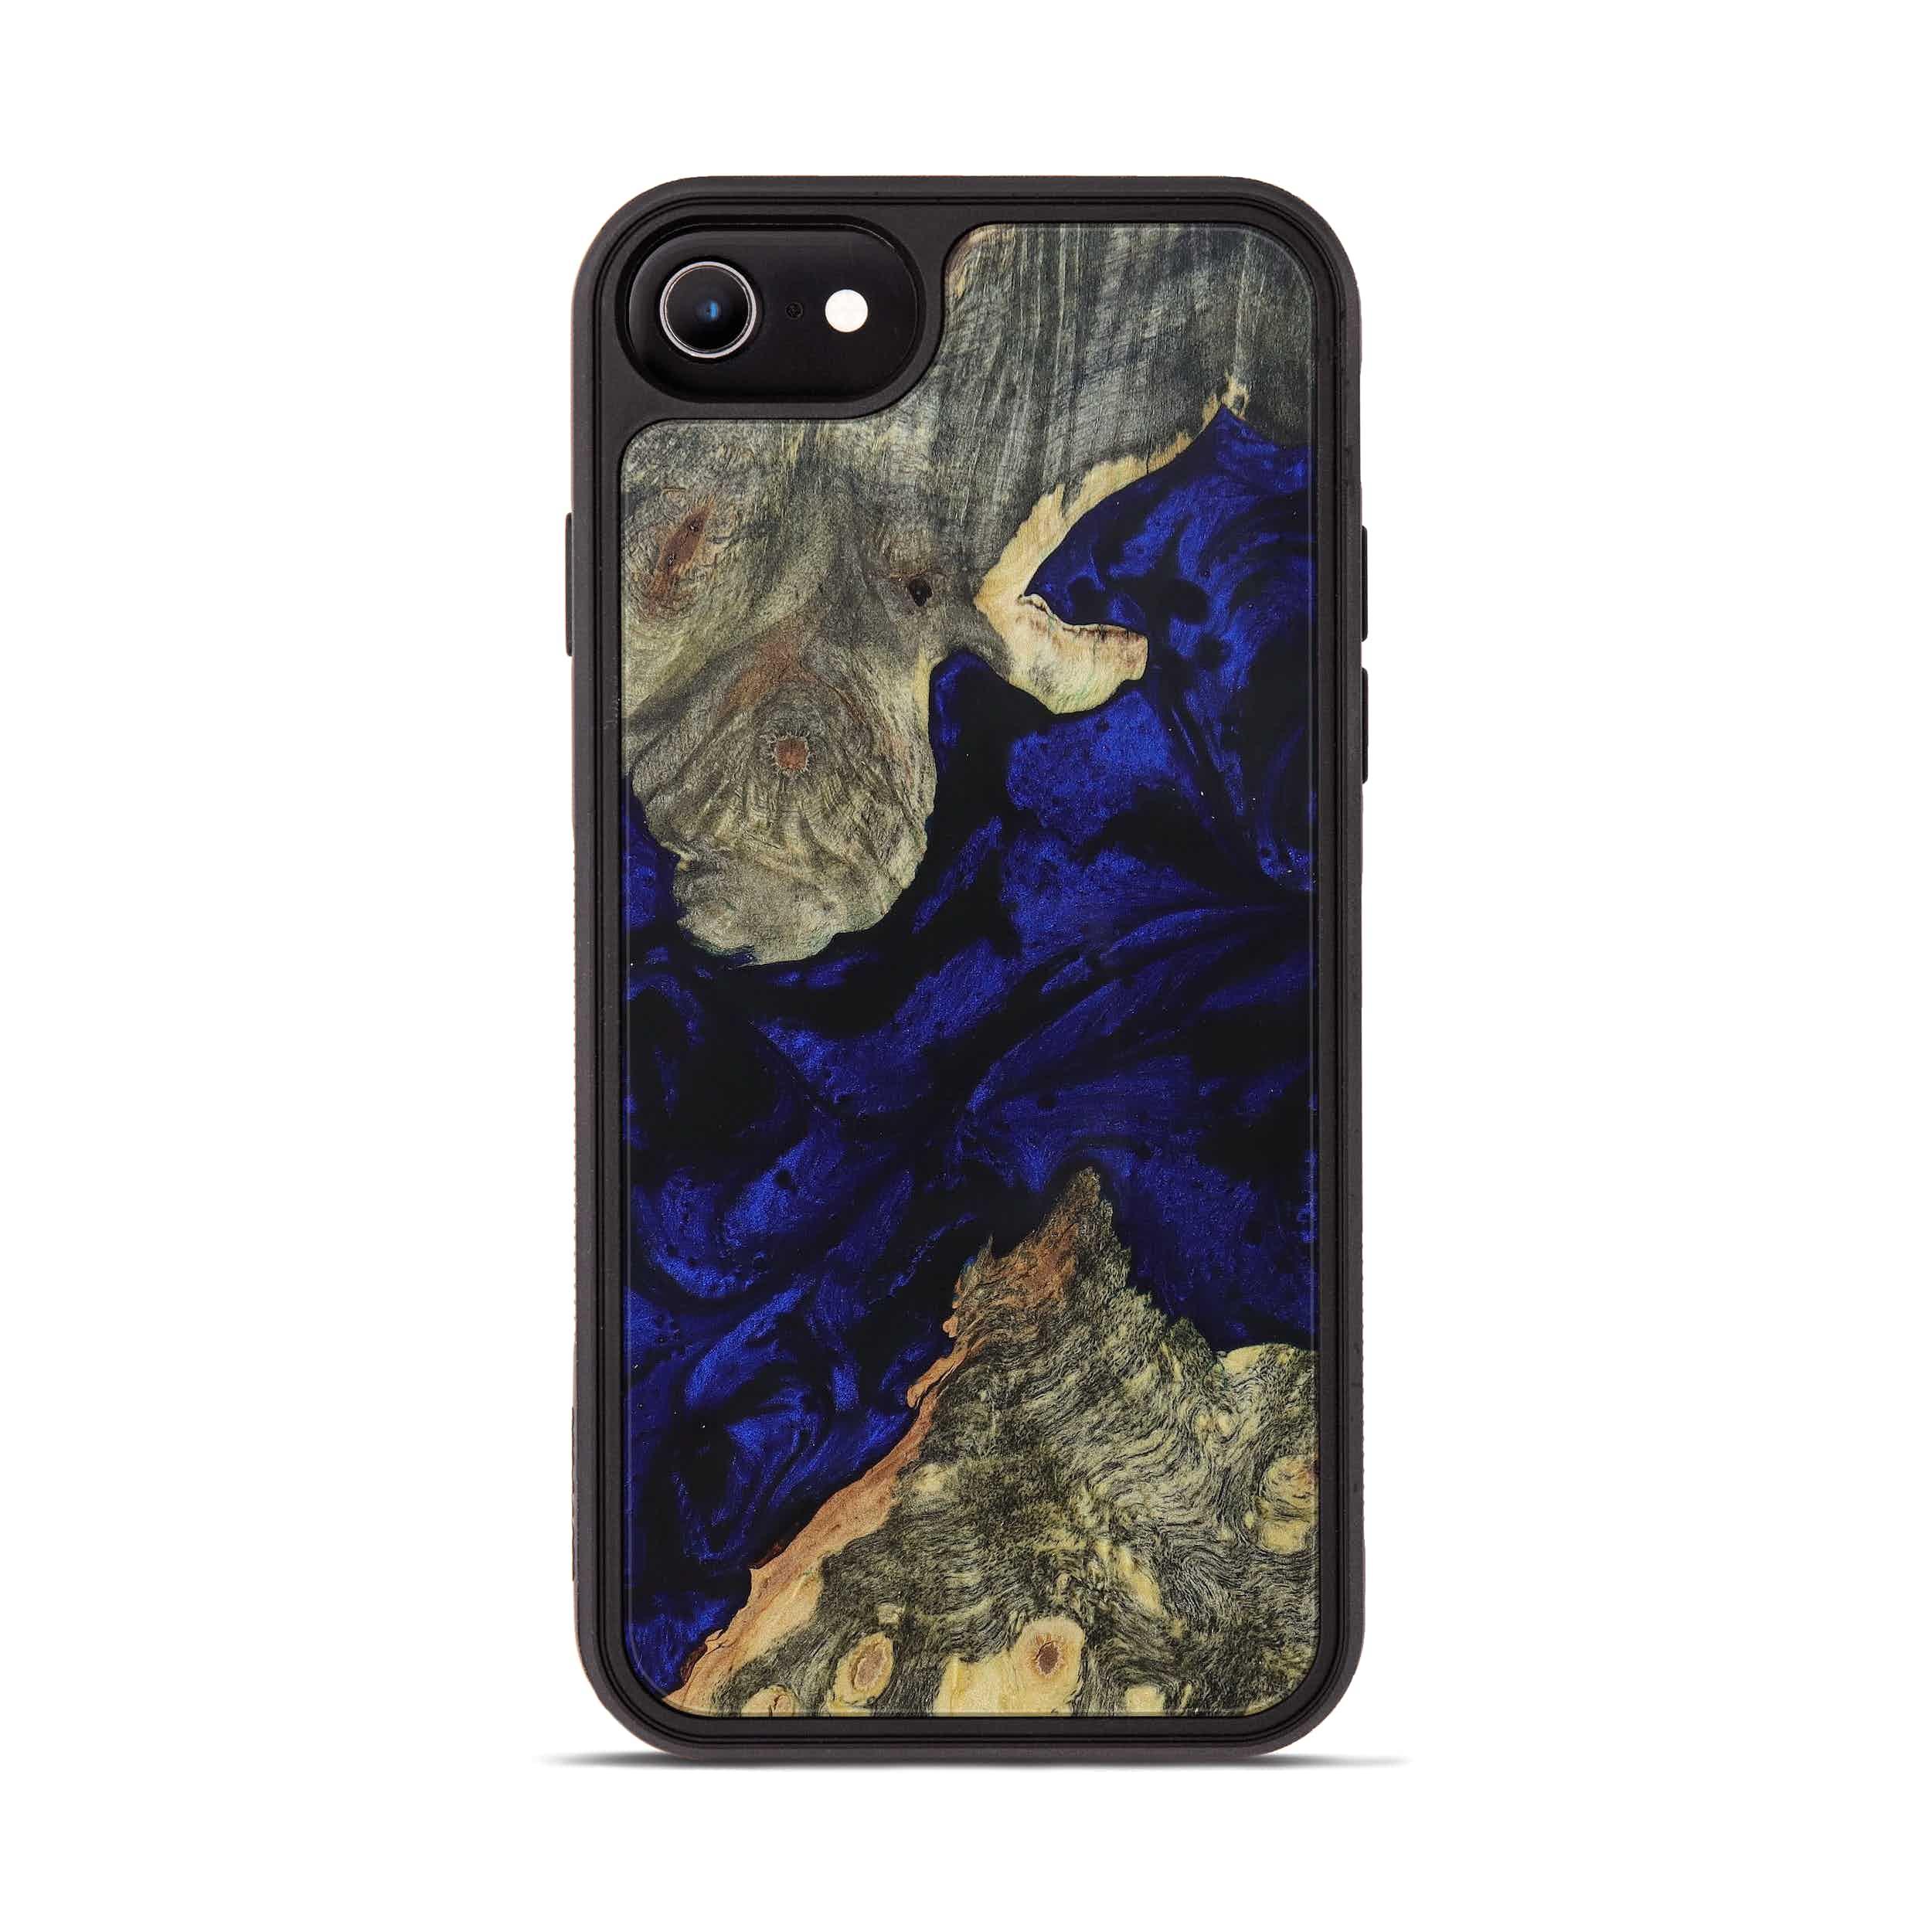 iPhone 8 Wood+Resin Phone Case - Rhiamon (Dark Blue, 394678)